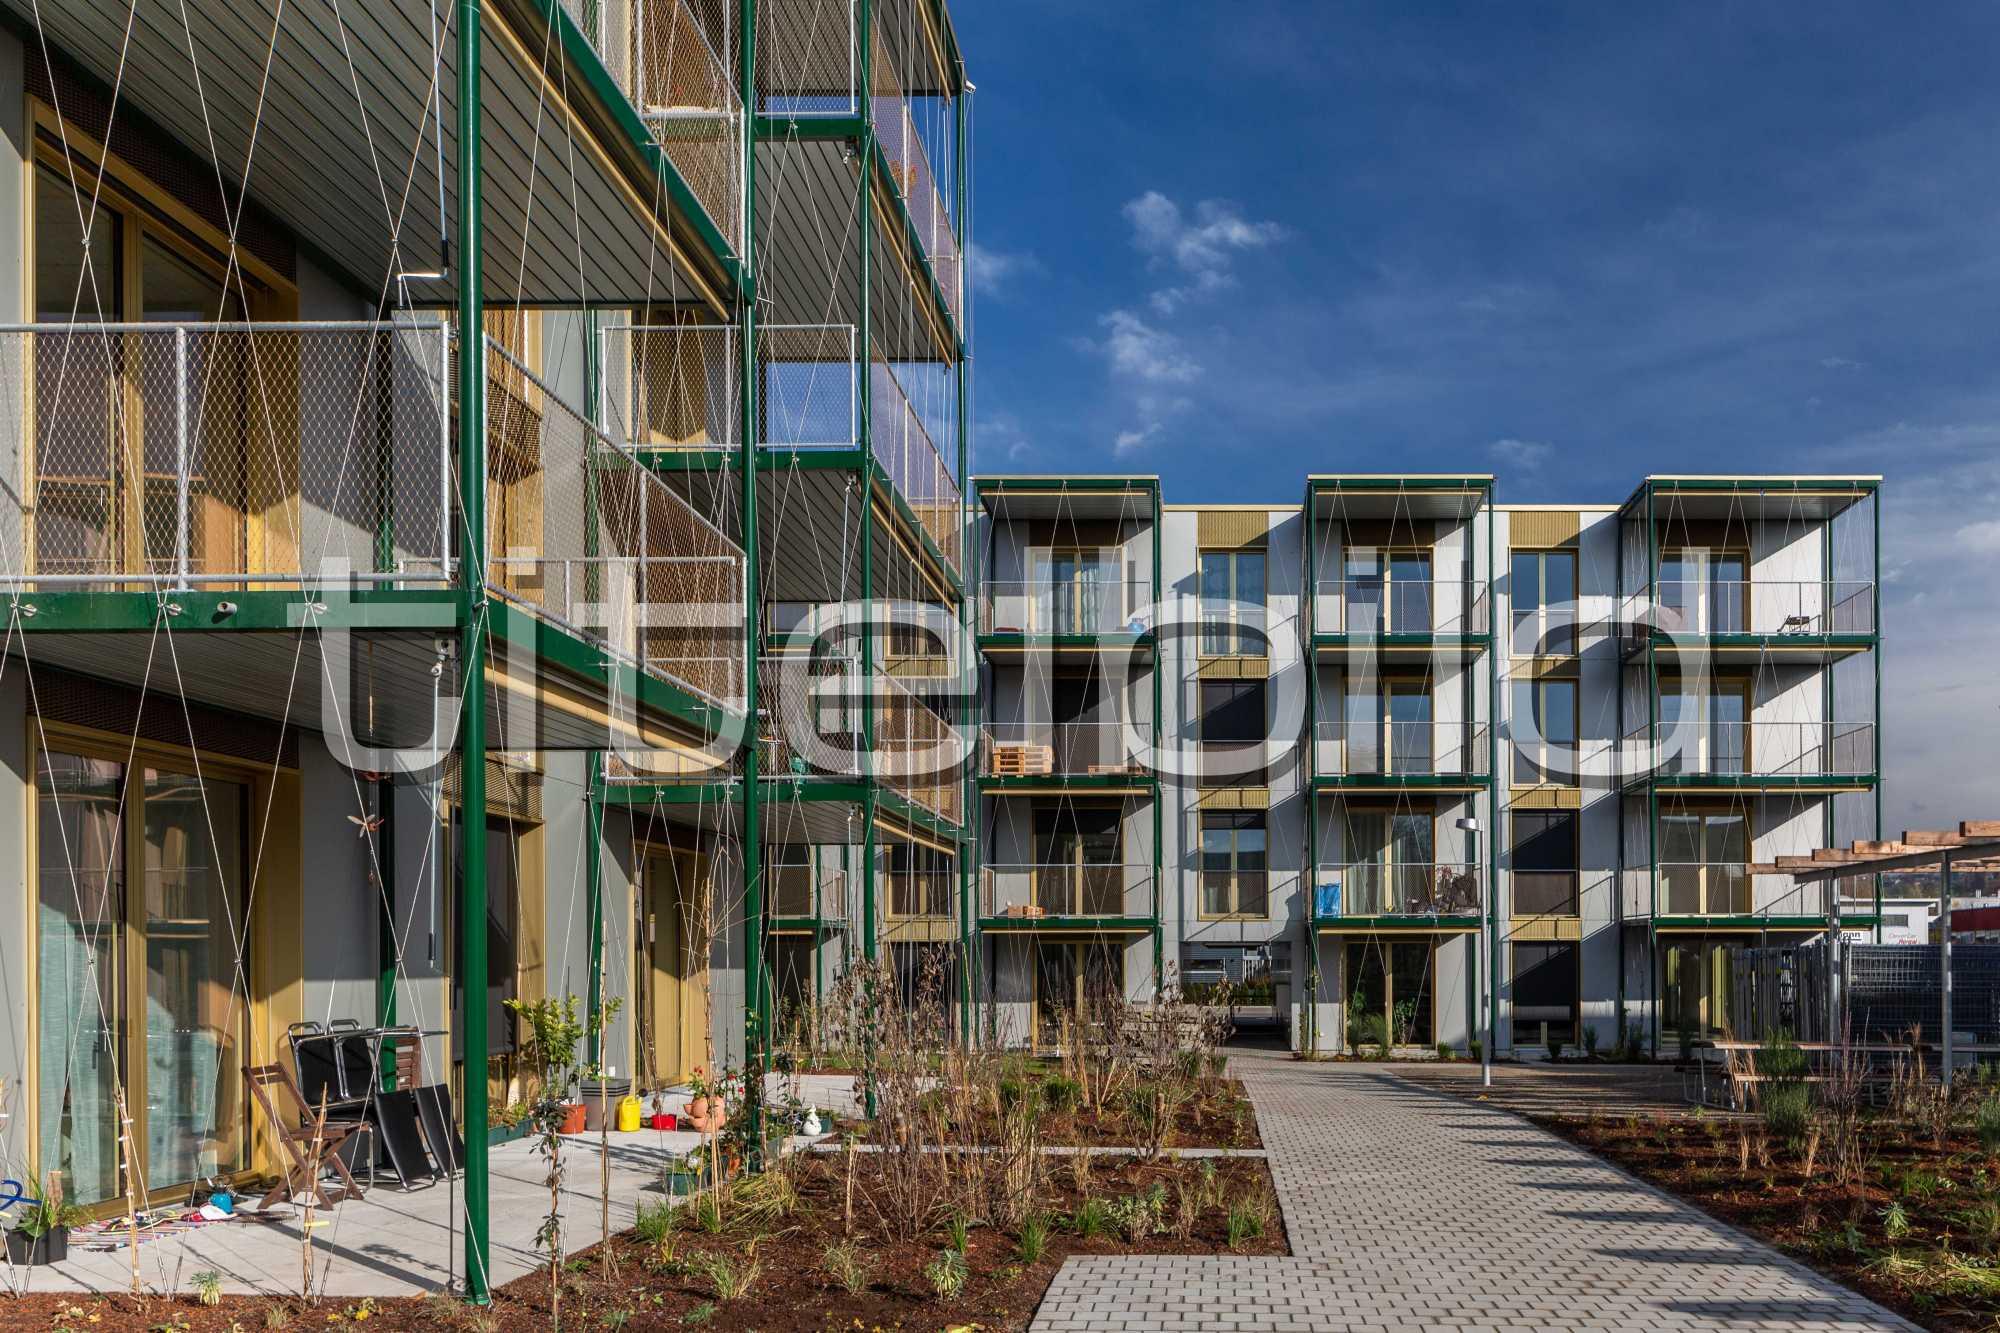 Projektbild-Nr. 3: Quattro Sorelle, Bülach